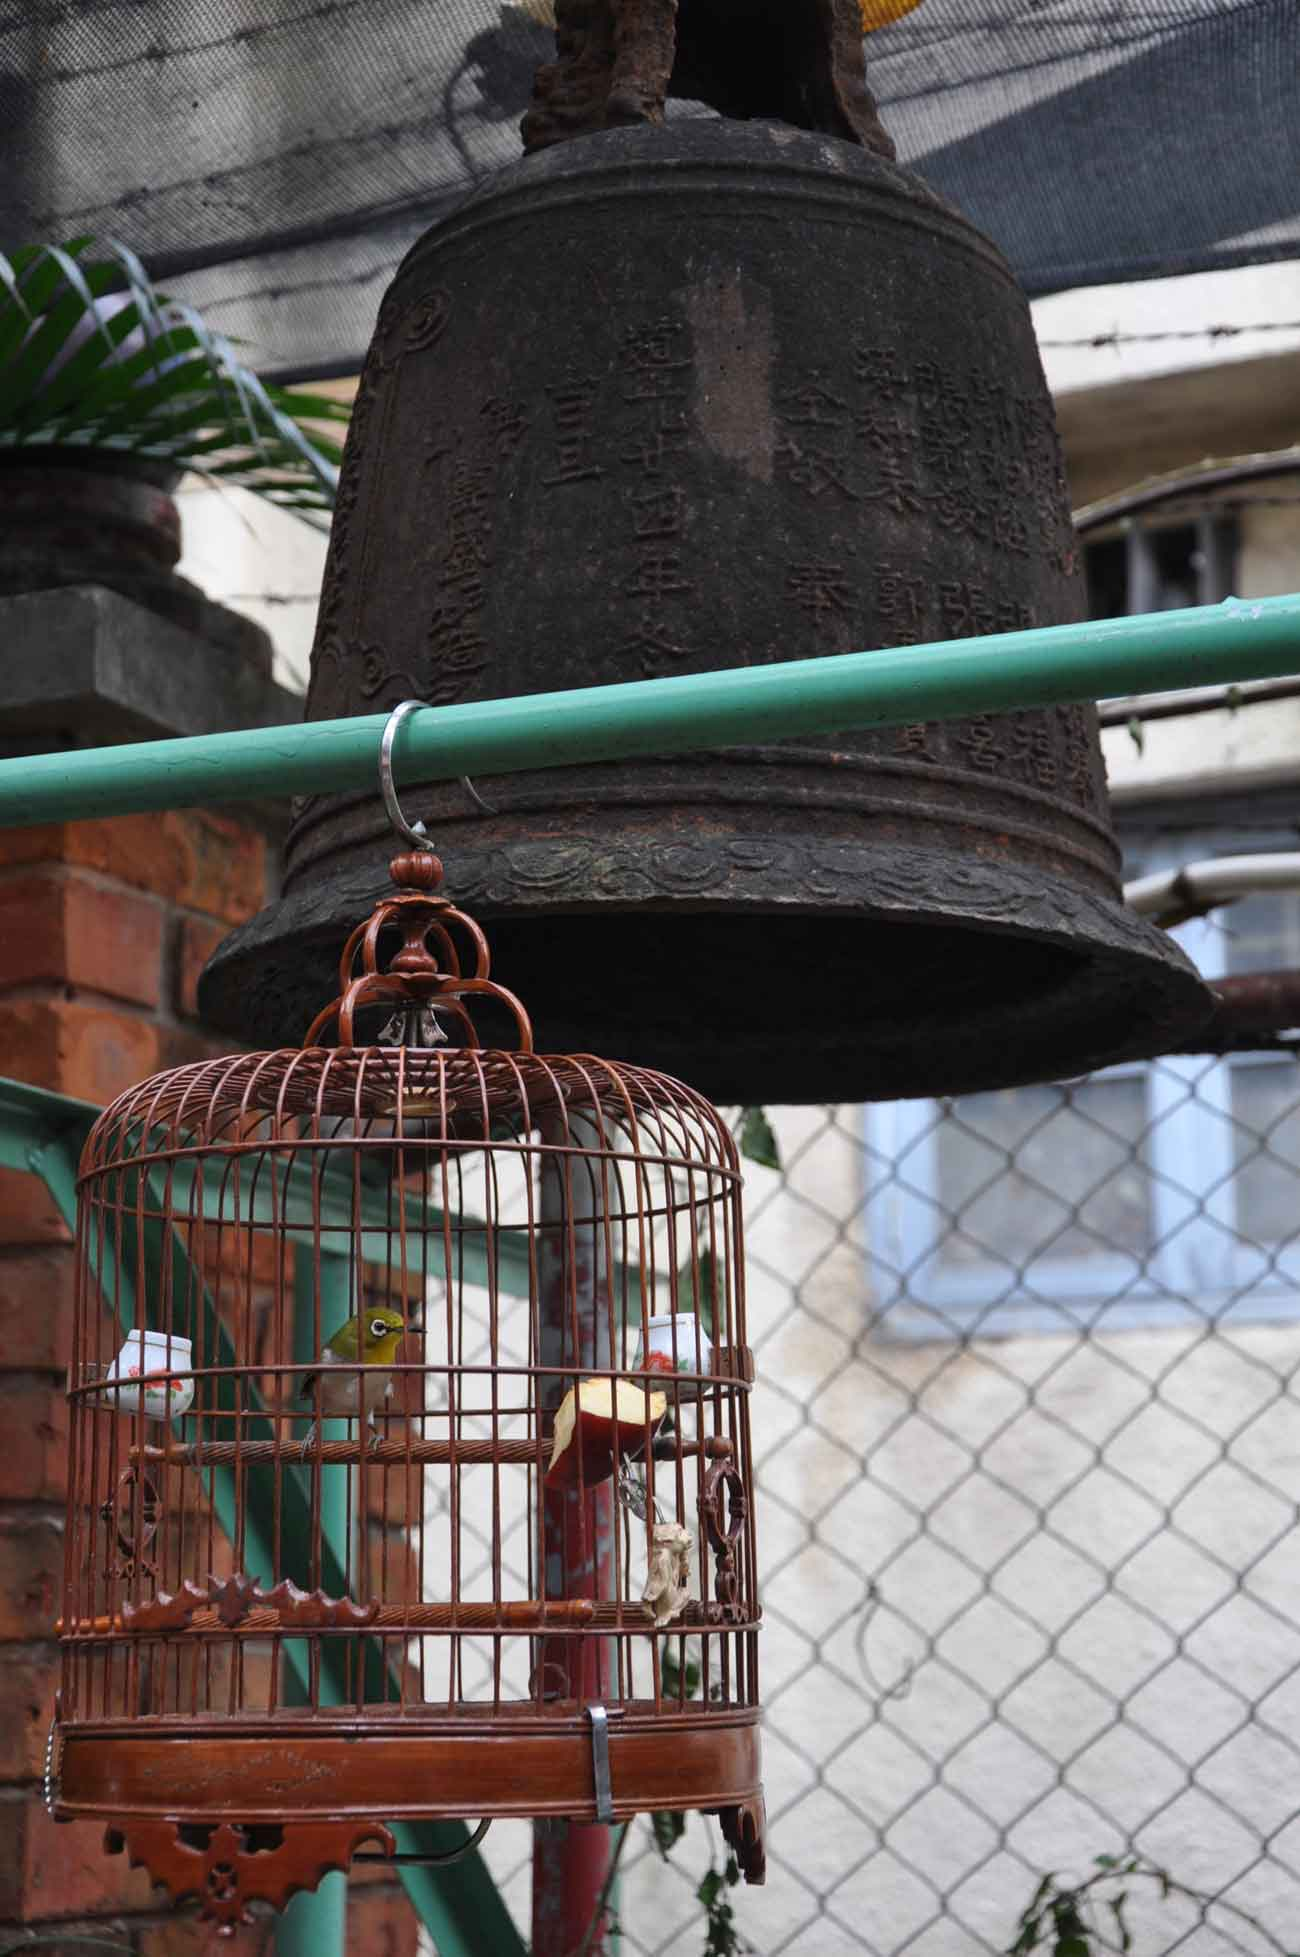 San Kiu Teahouse Macau bell and birdhouse